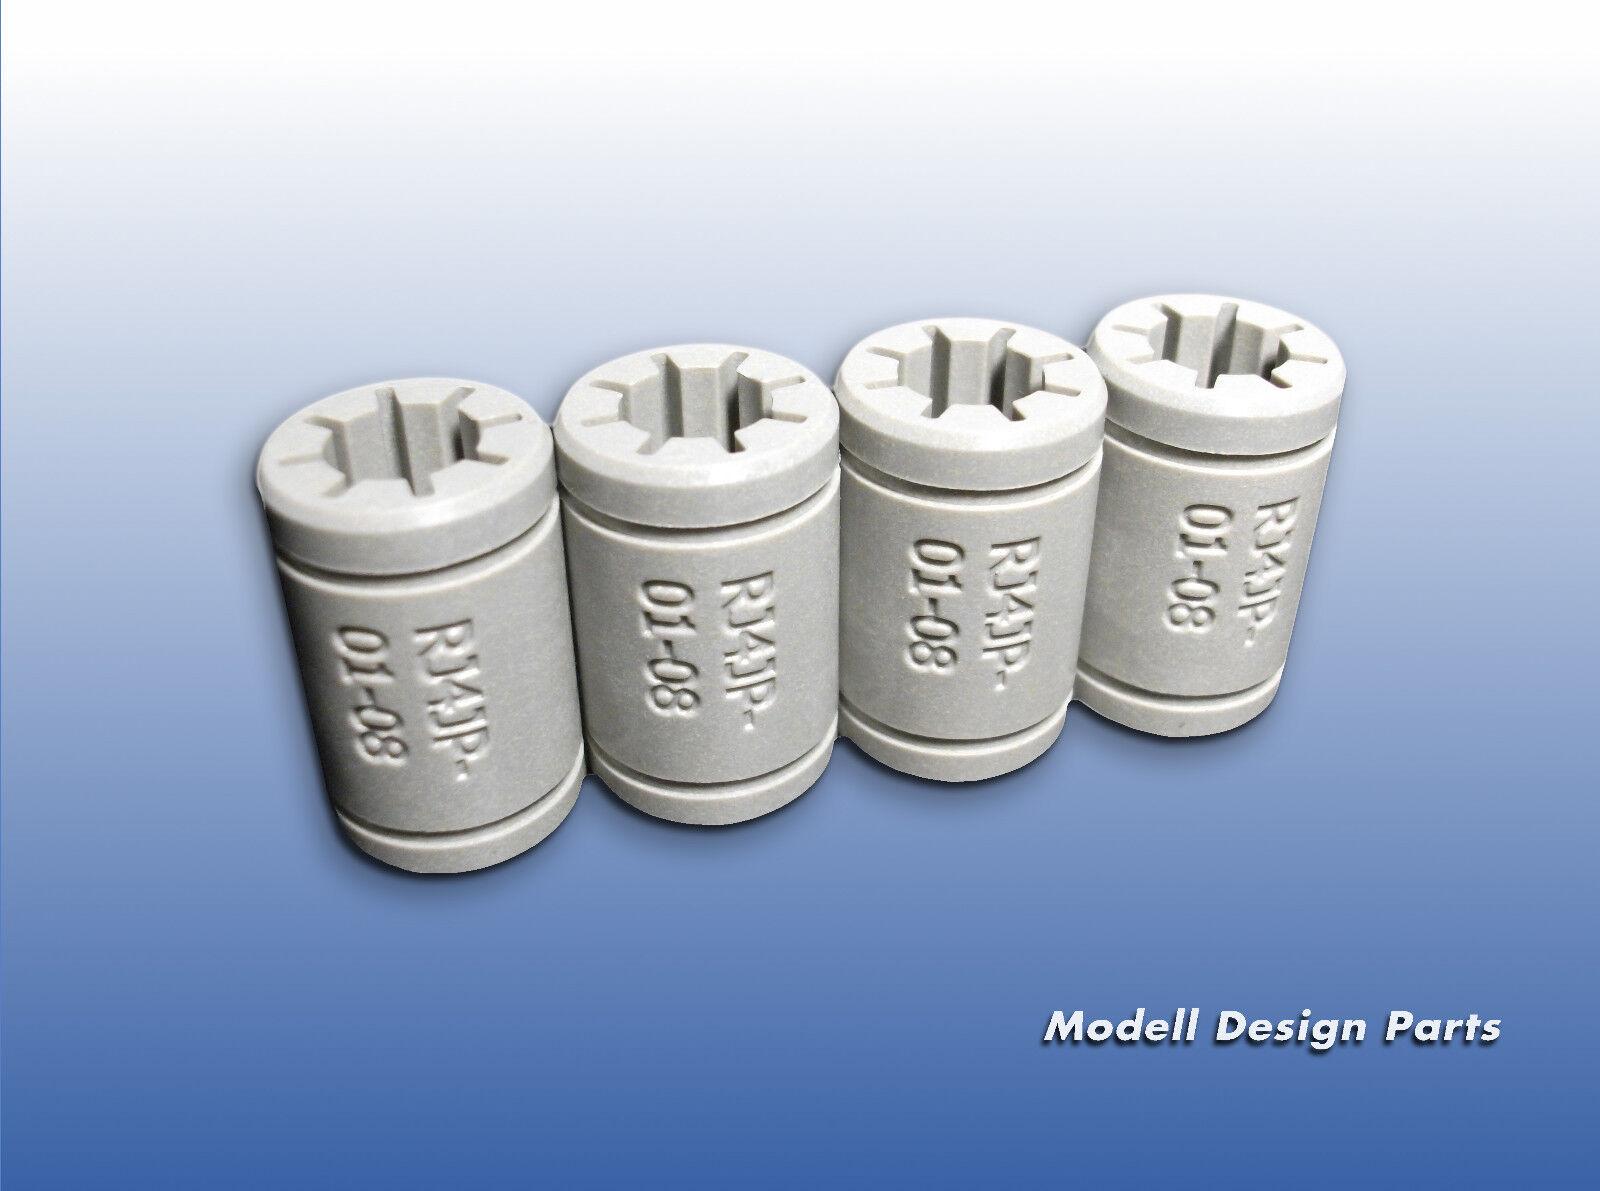 SC8i Lagerblock mit Igus DryLin® RJ4JP Linearlager CNC Gleitlager statt SC8UU